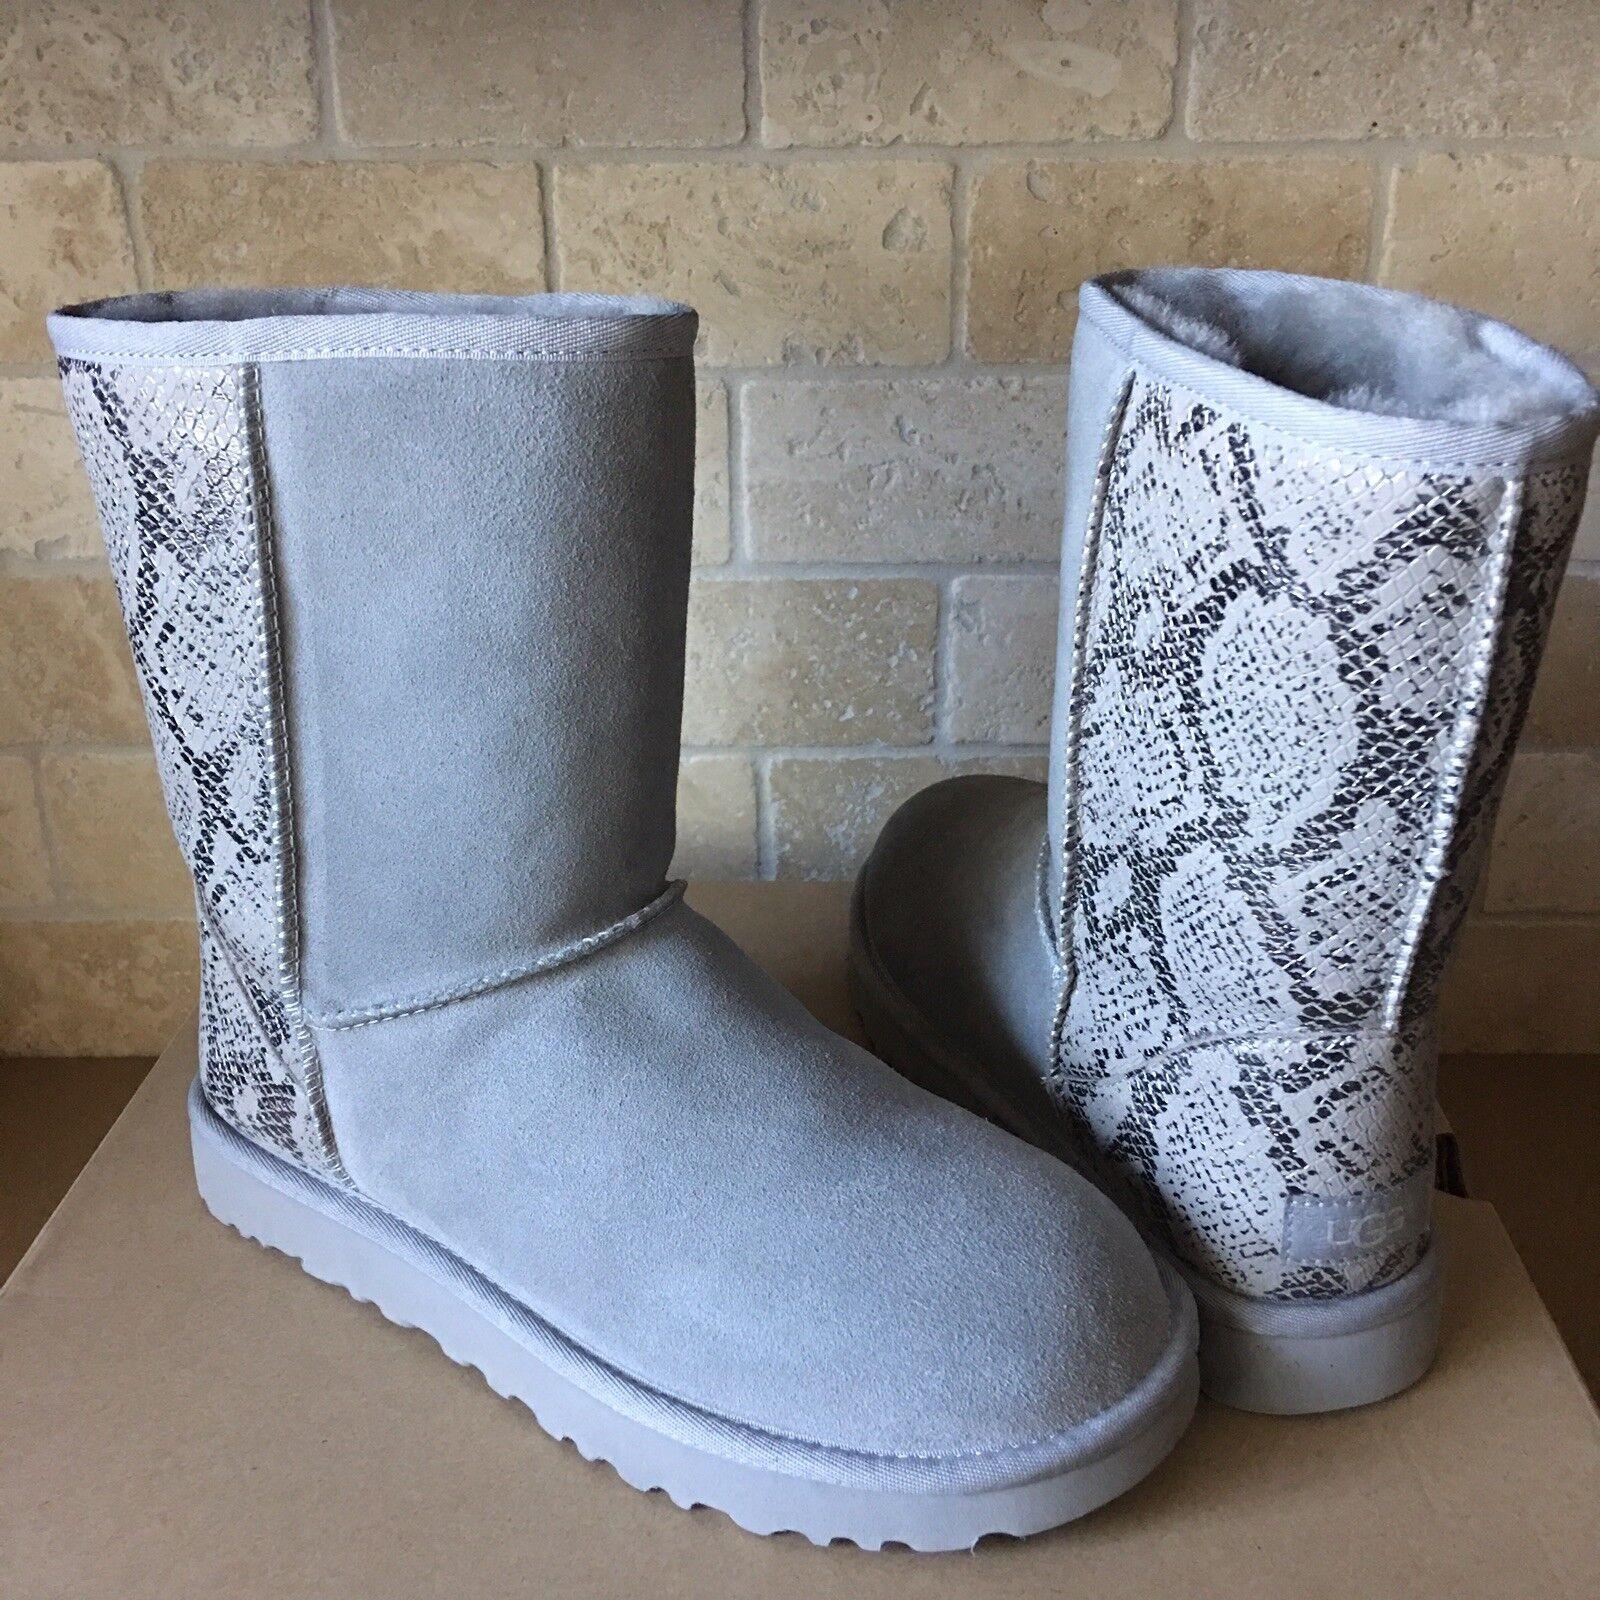 6f1340de7c5 UGG Classic Short Metallic Snake Silver Suede Sheepskin Boots Size US 11  Womens